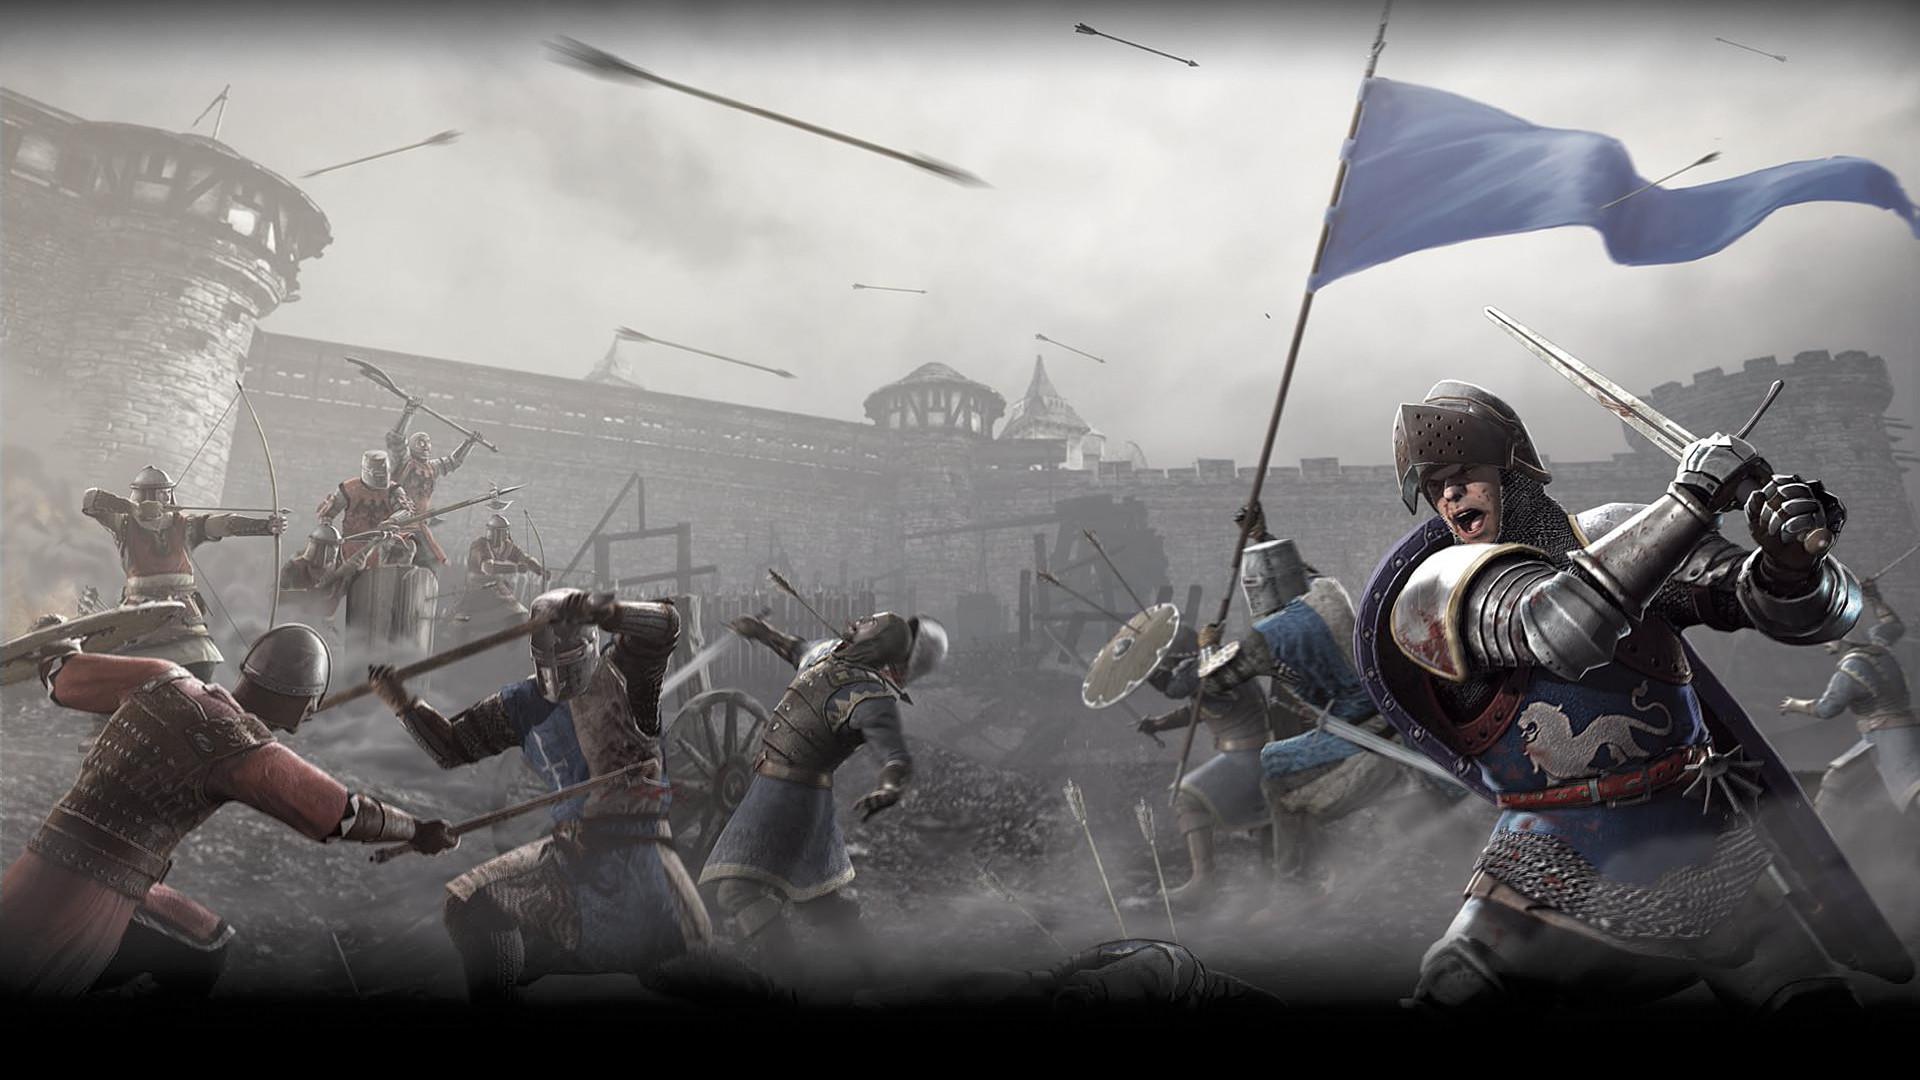 chivalry-medieval-warfare-wallpaper-1